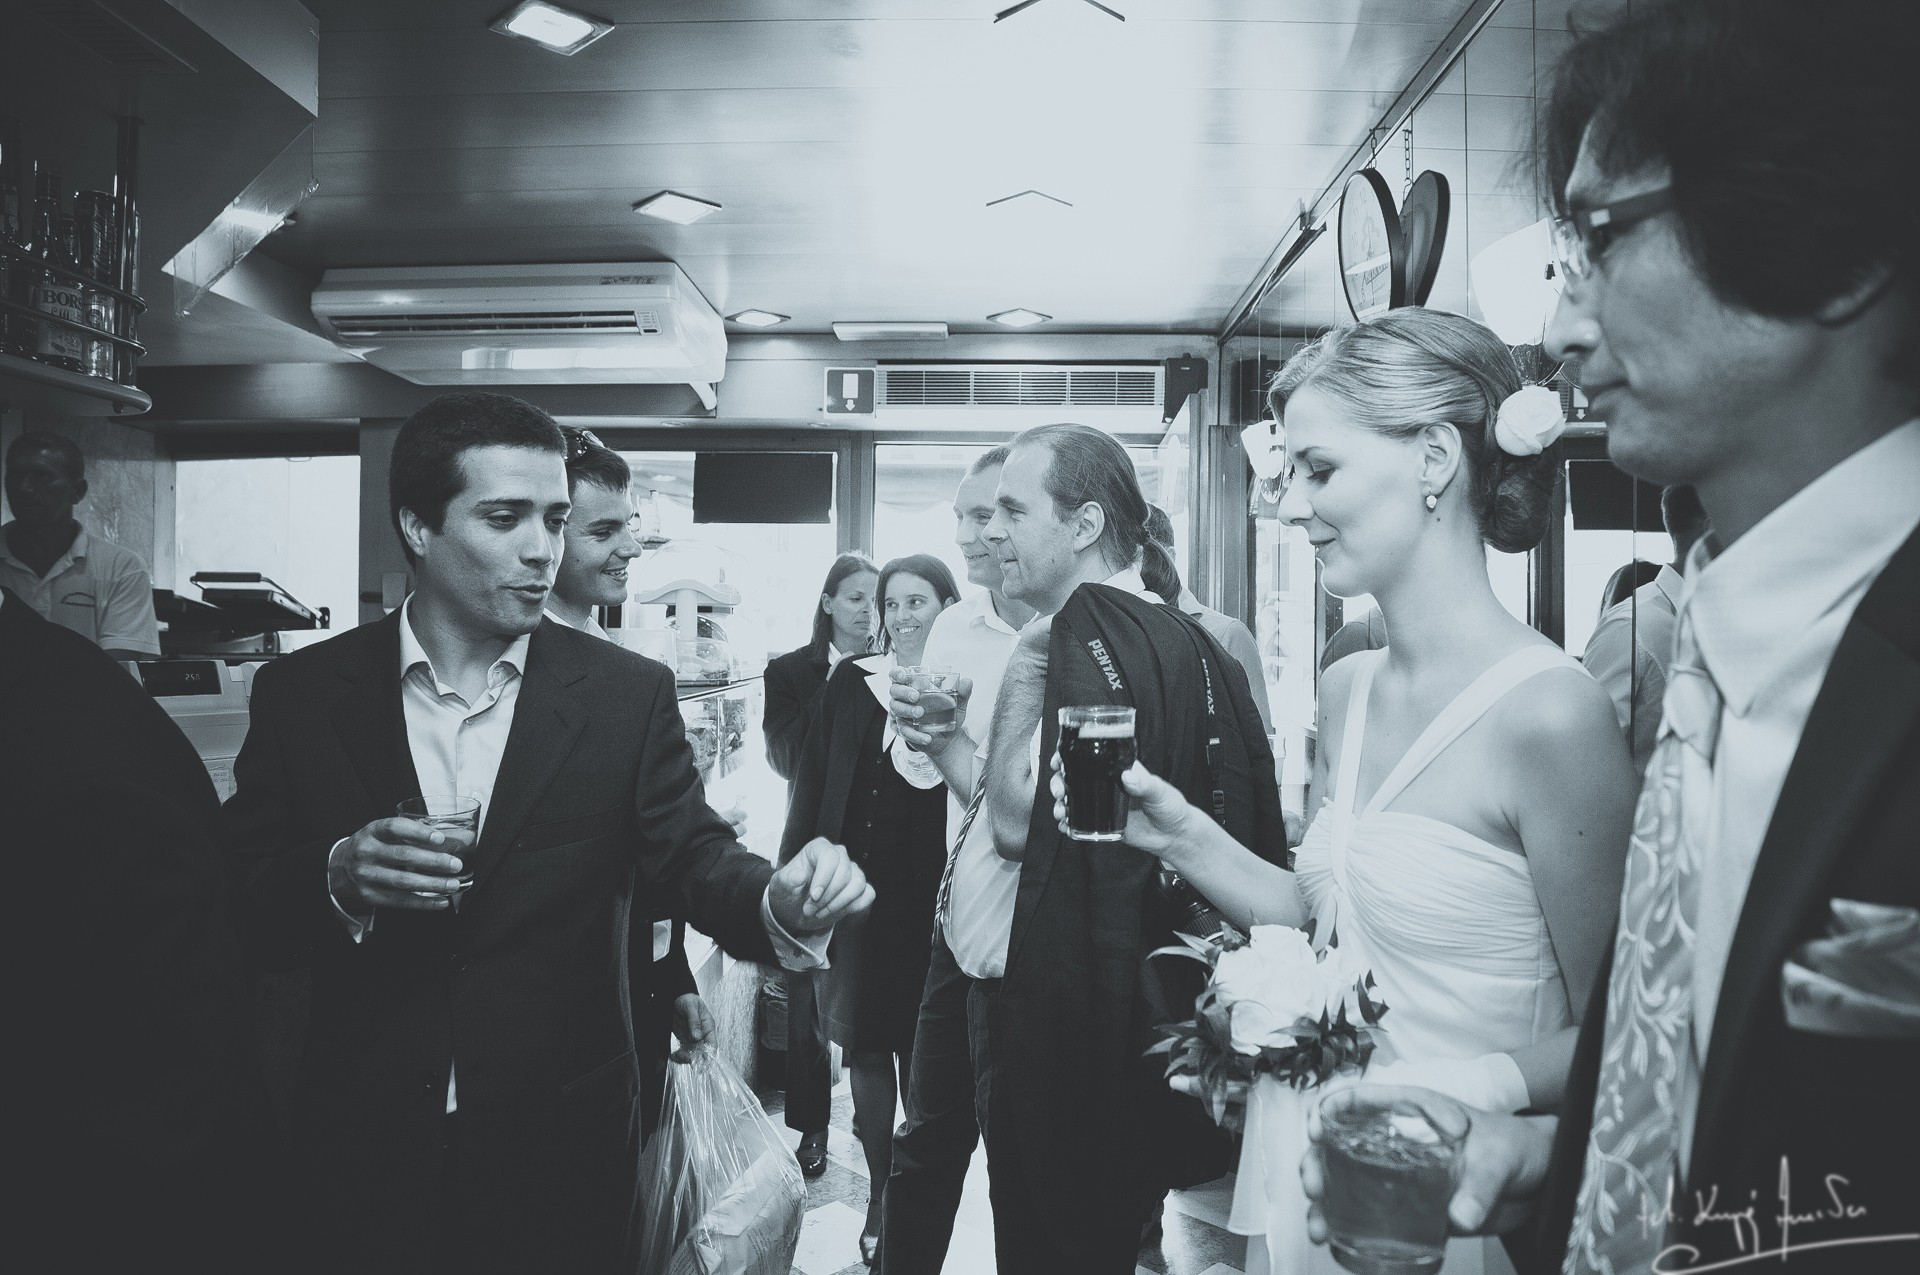 Ślub w wenecji 50 Manuela Luiza & Young Seon Song